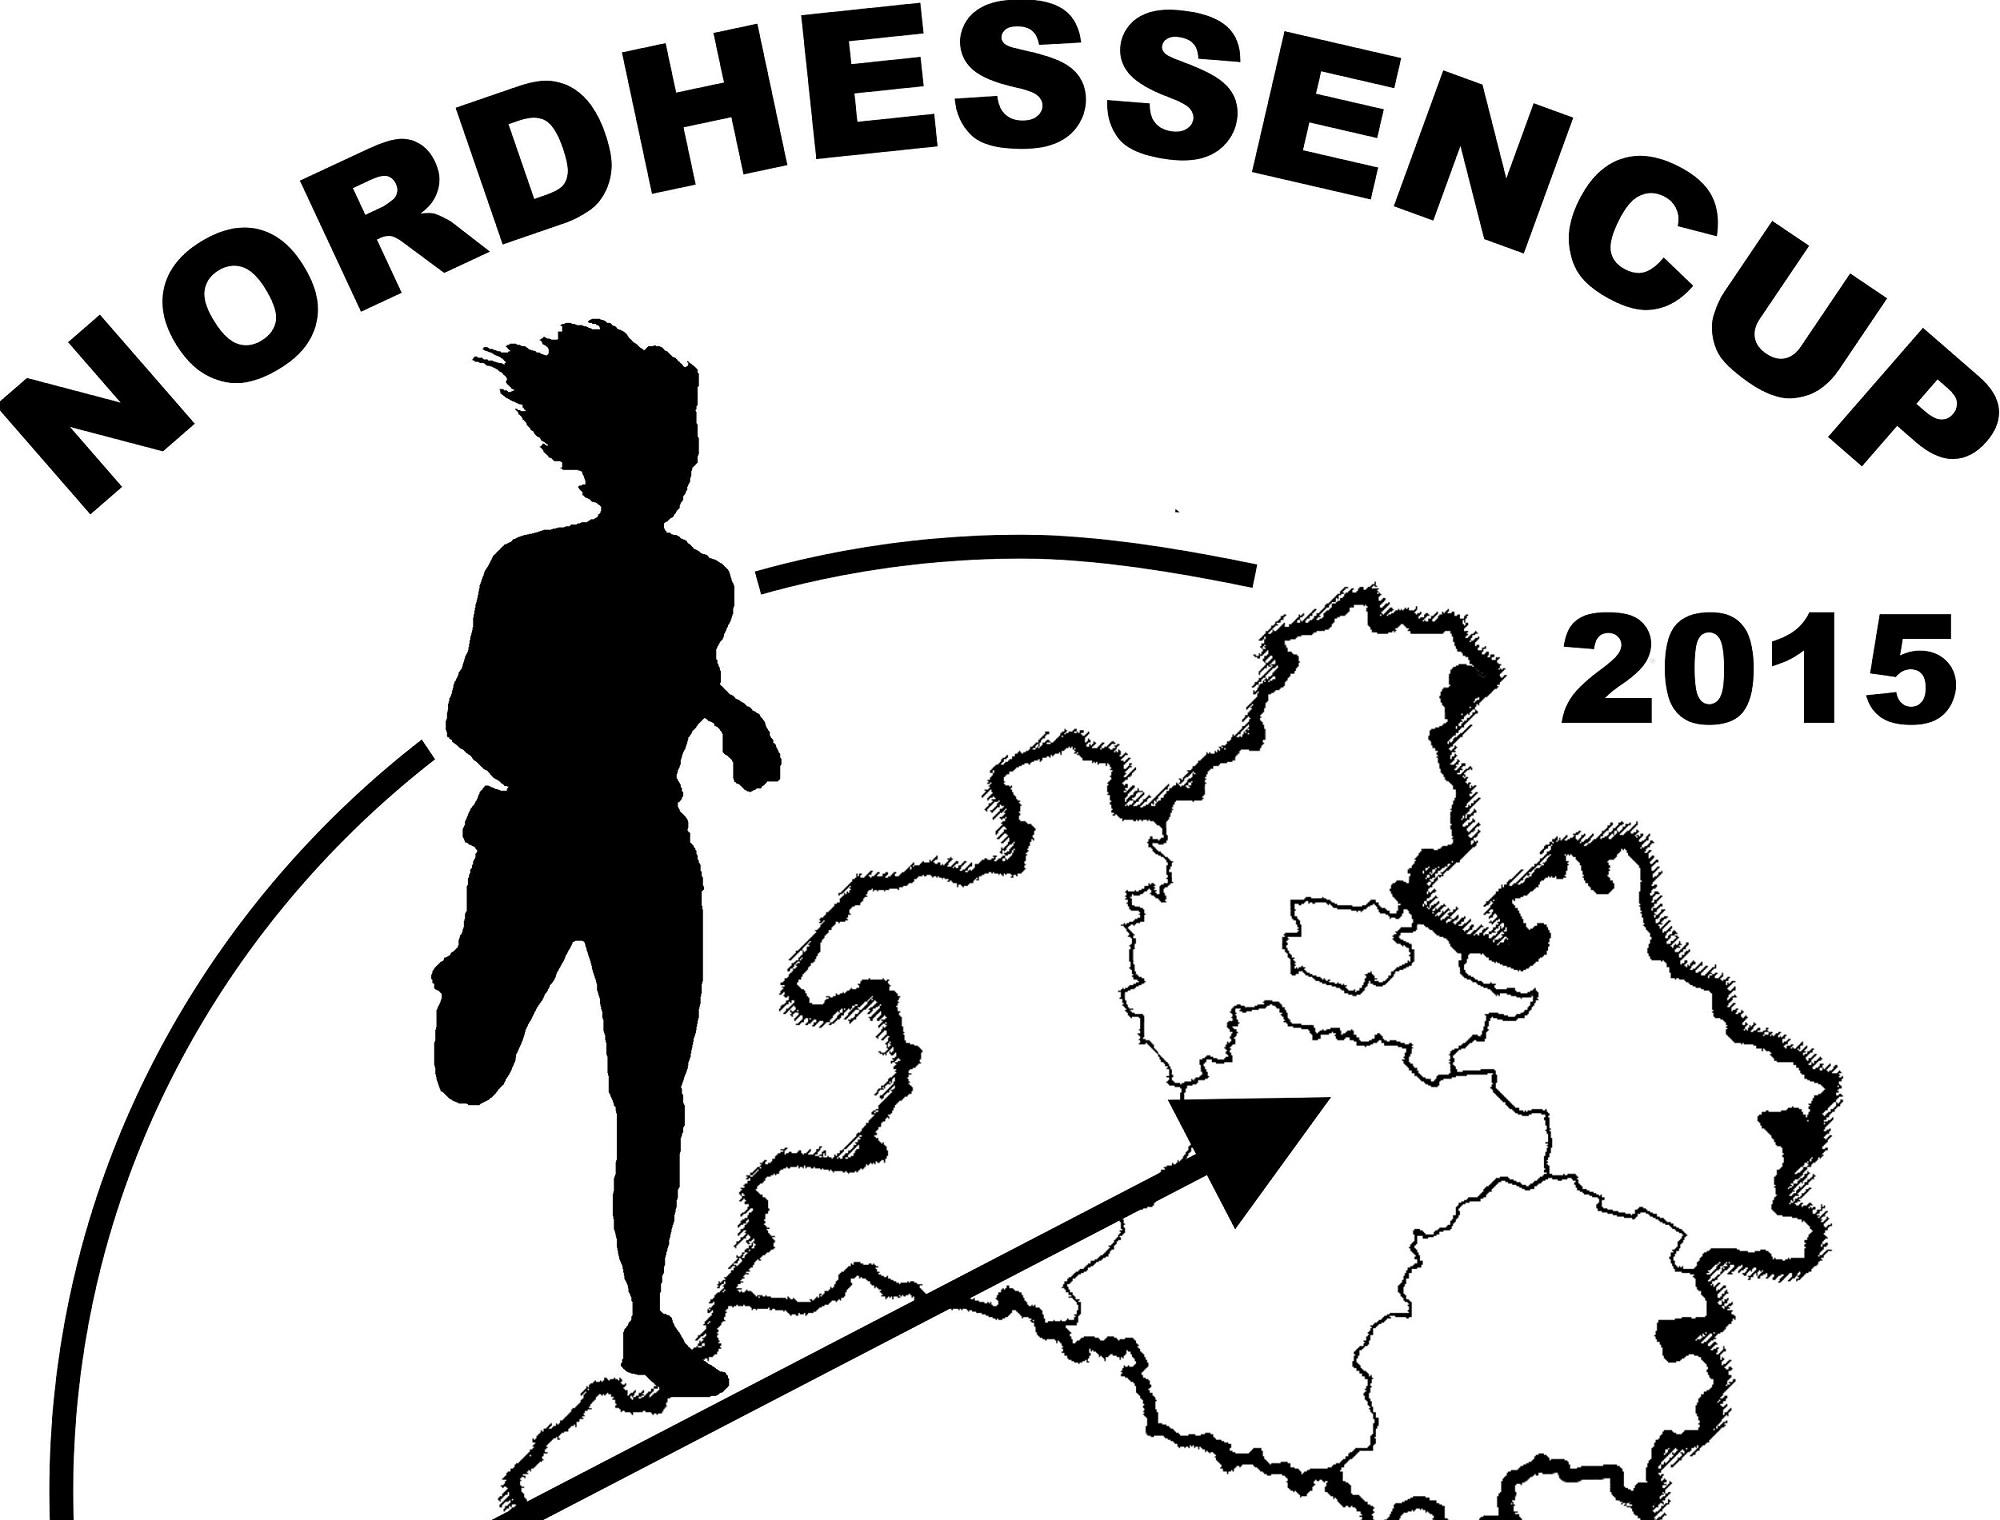 Nordhessencup